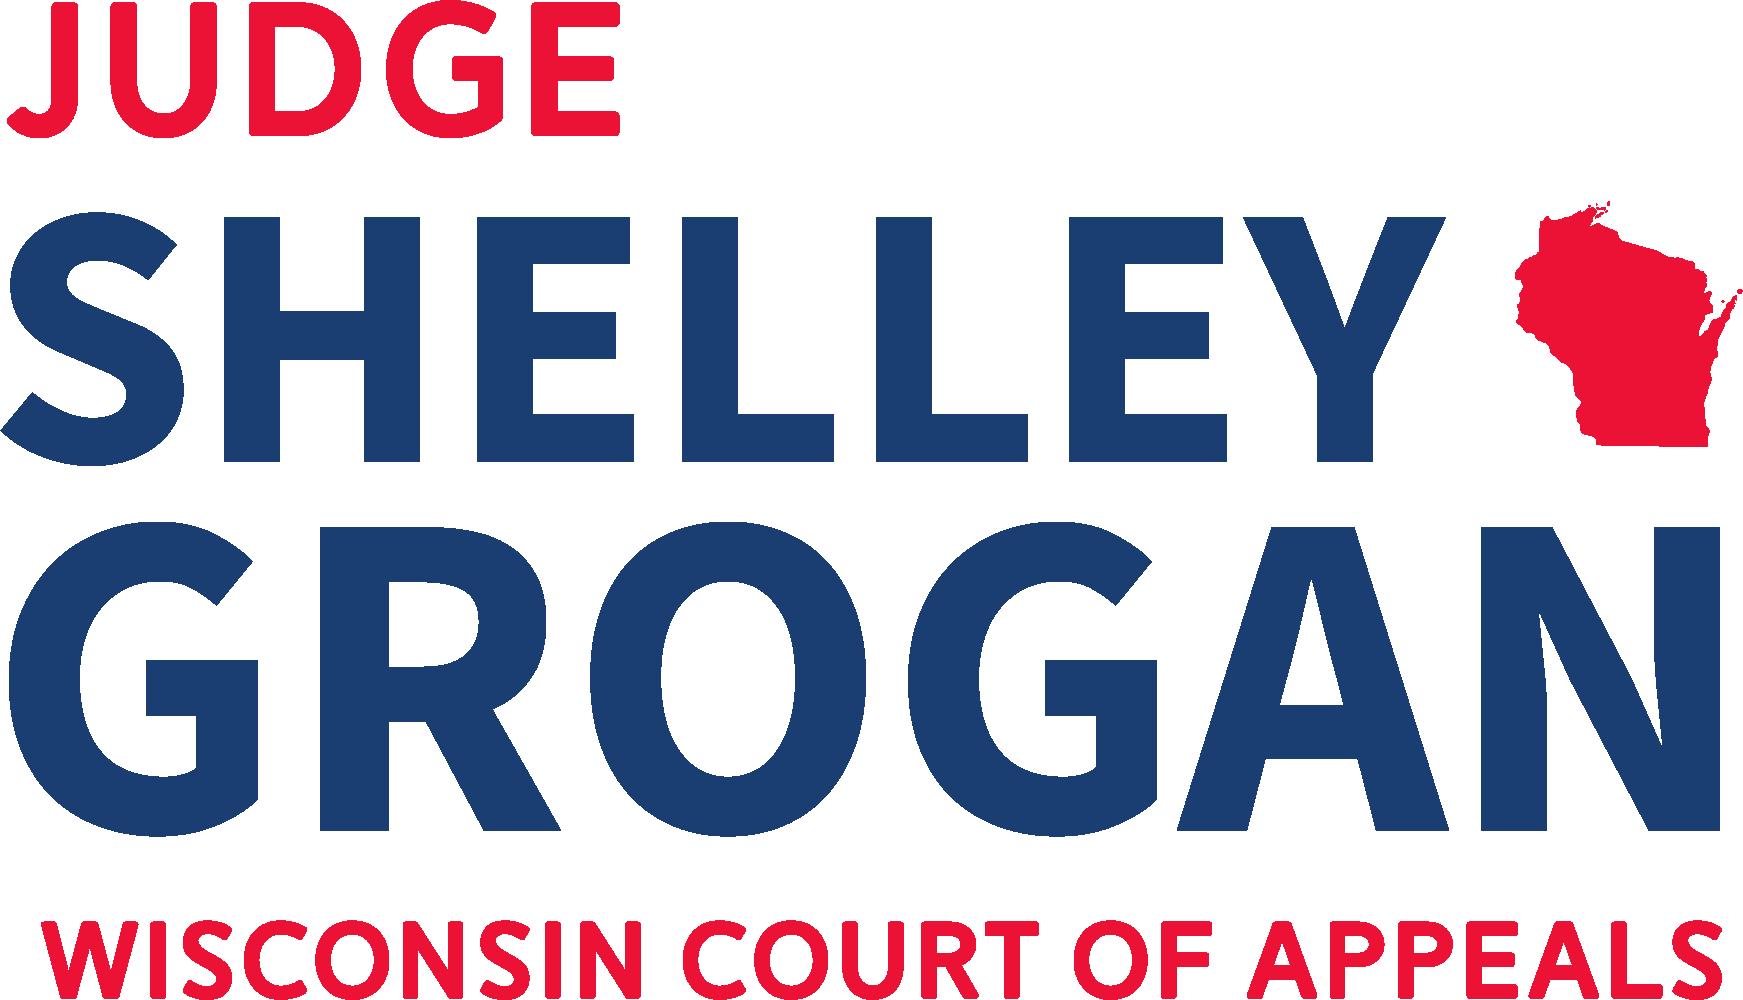 Shelley grogan